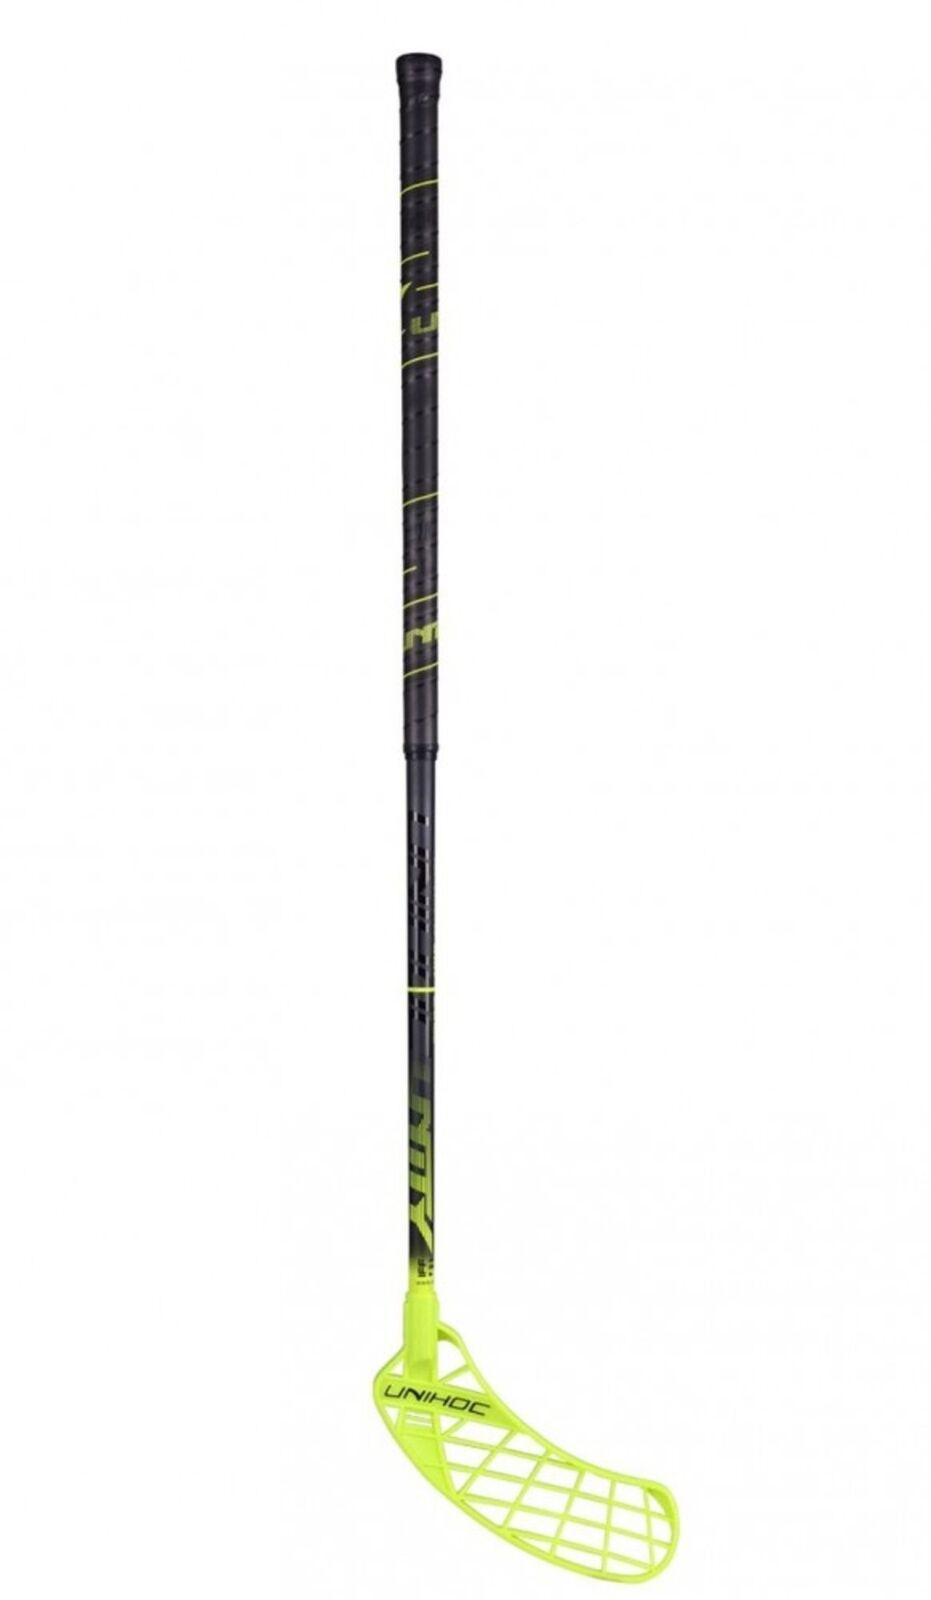 Floorballschläger Unihoc UNITY 28 Floorball Stick Carbon 92-100cm